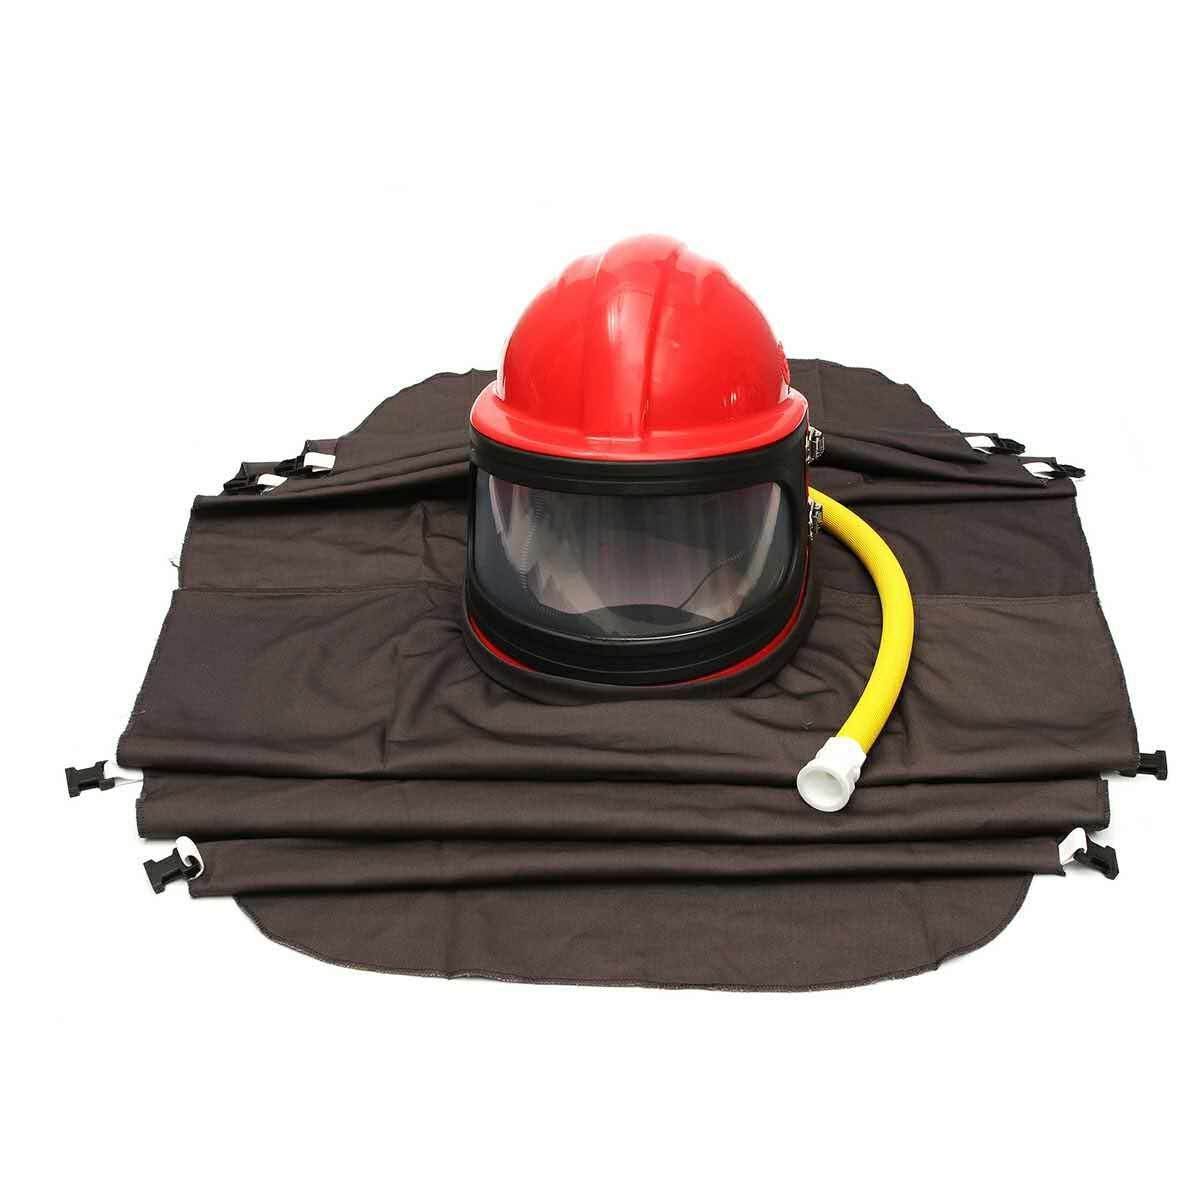 Southern Chem AIR FED Safety Sandblast Helmet Sand Blast Hood Protector for Sandblasting